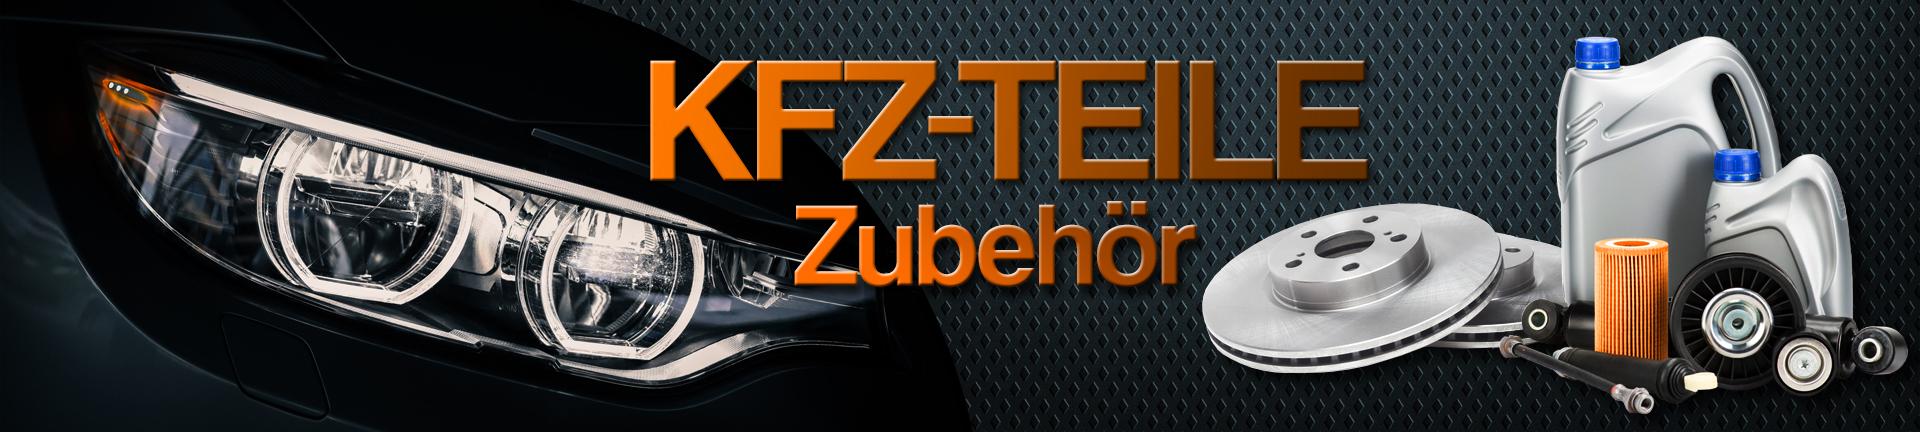 Auspuff Skoda Fabia Kombi Seat Cordoba Stufenheck 1.2 Endschalldämpfer *740